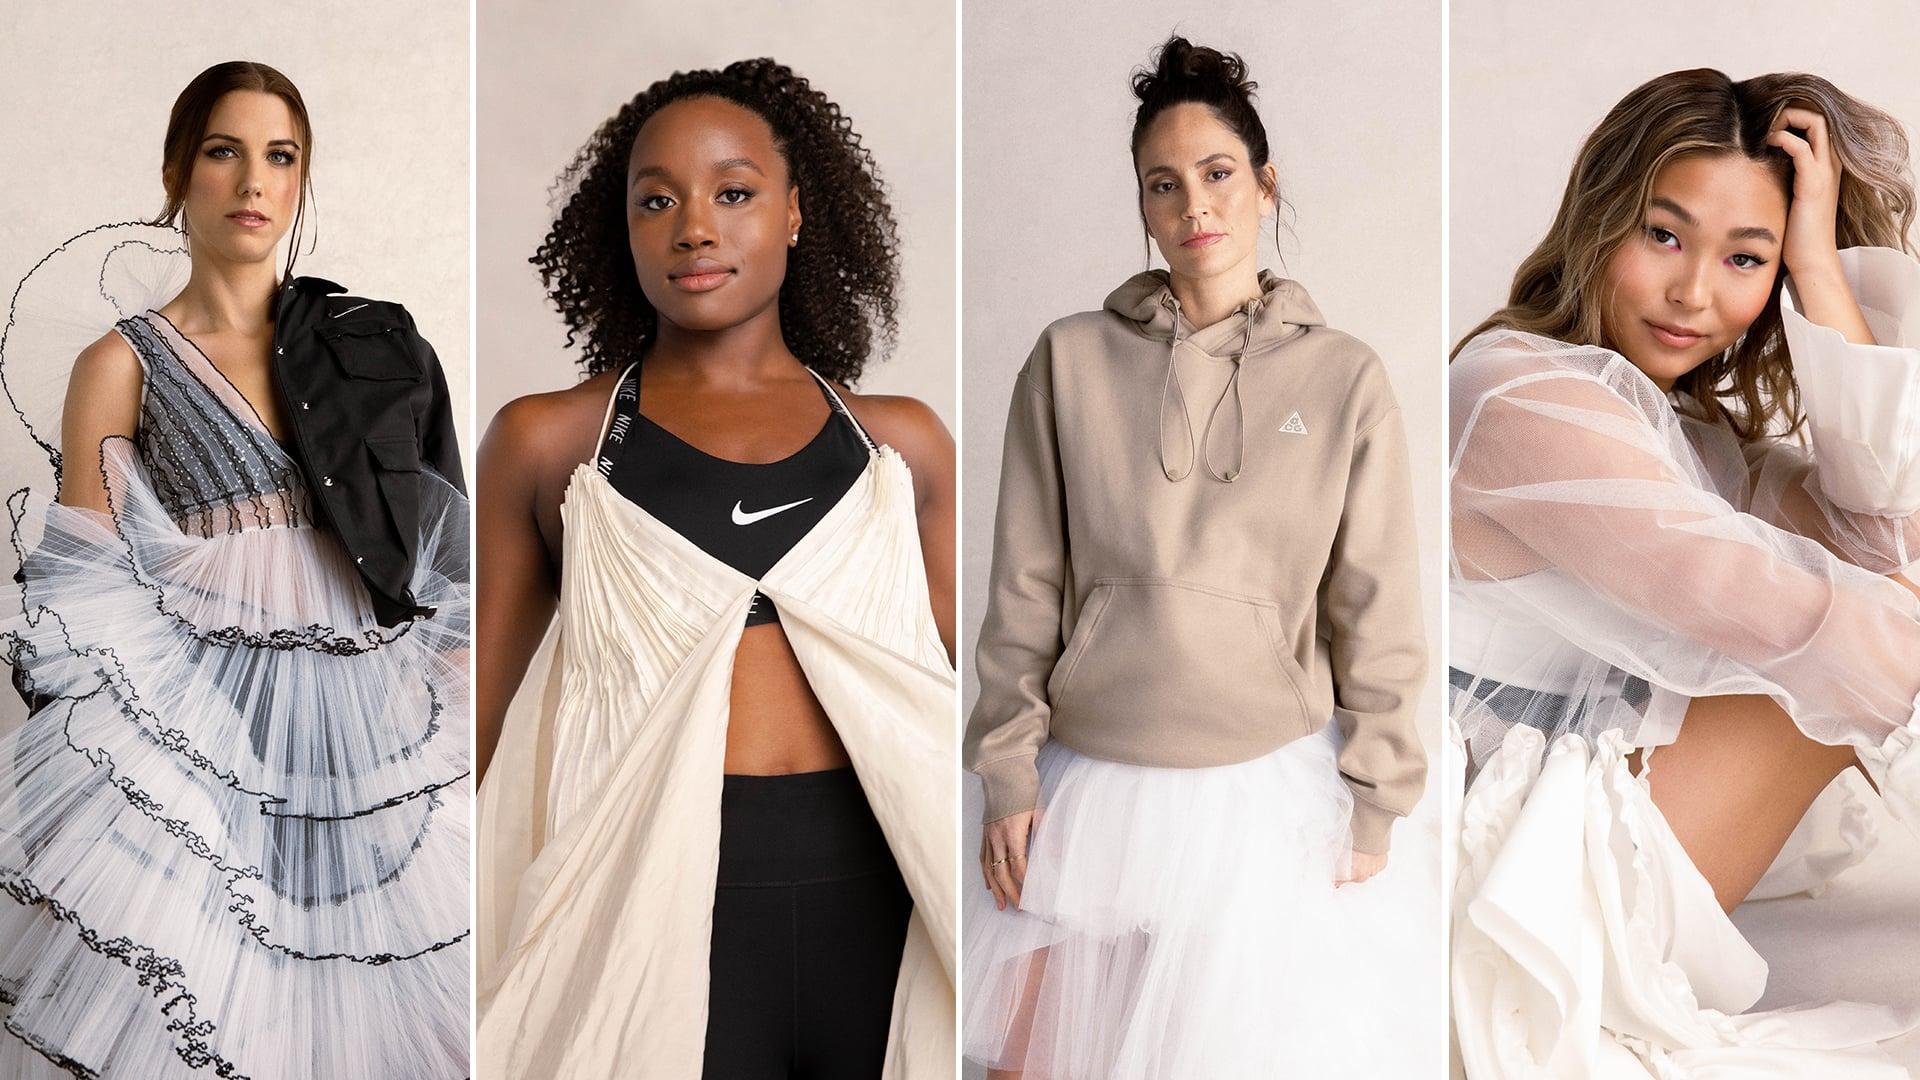 Alex Morgan, Simone Manuel, Sue Bird, and Chloe Kim launch women's media brand TOGETHXR